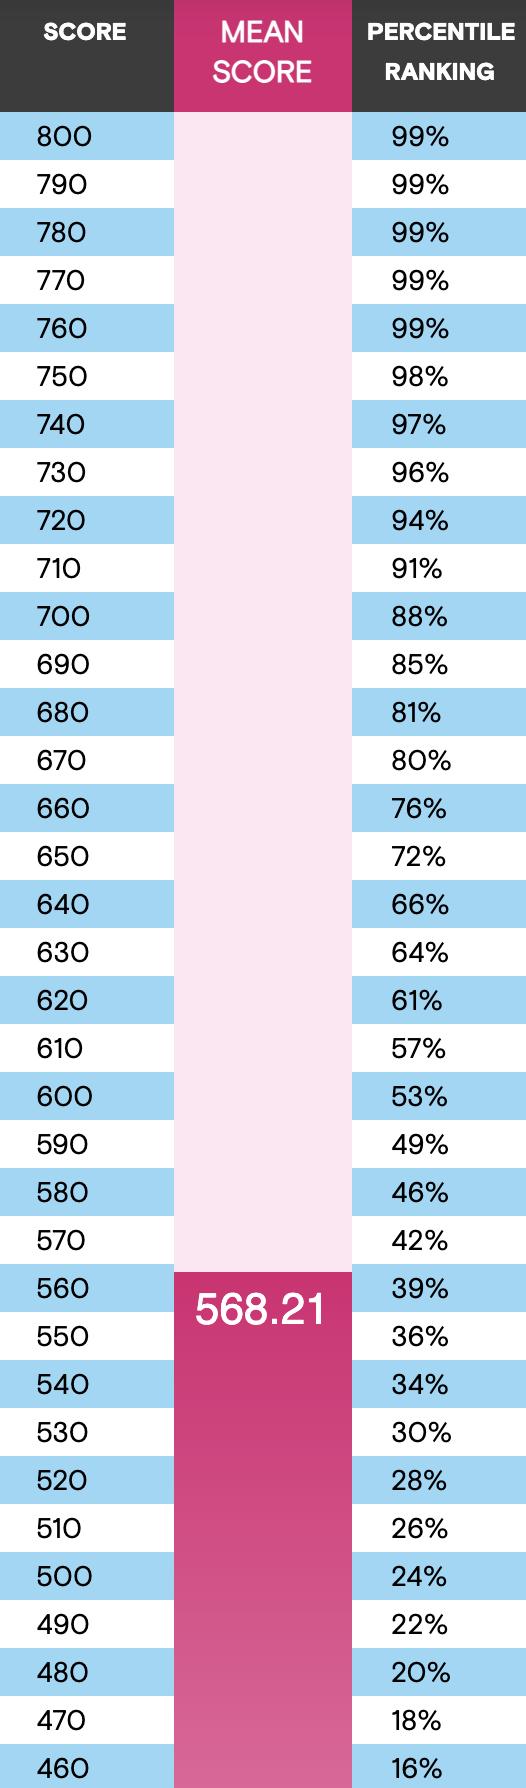 GMAT Percentiles Chart 2018 to 2020